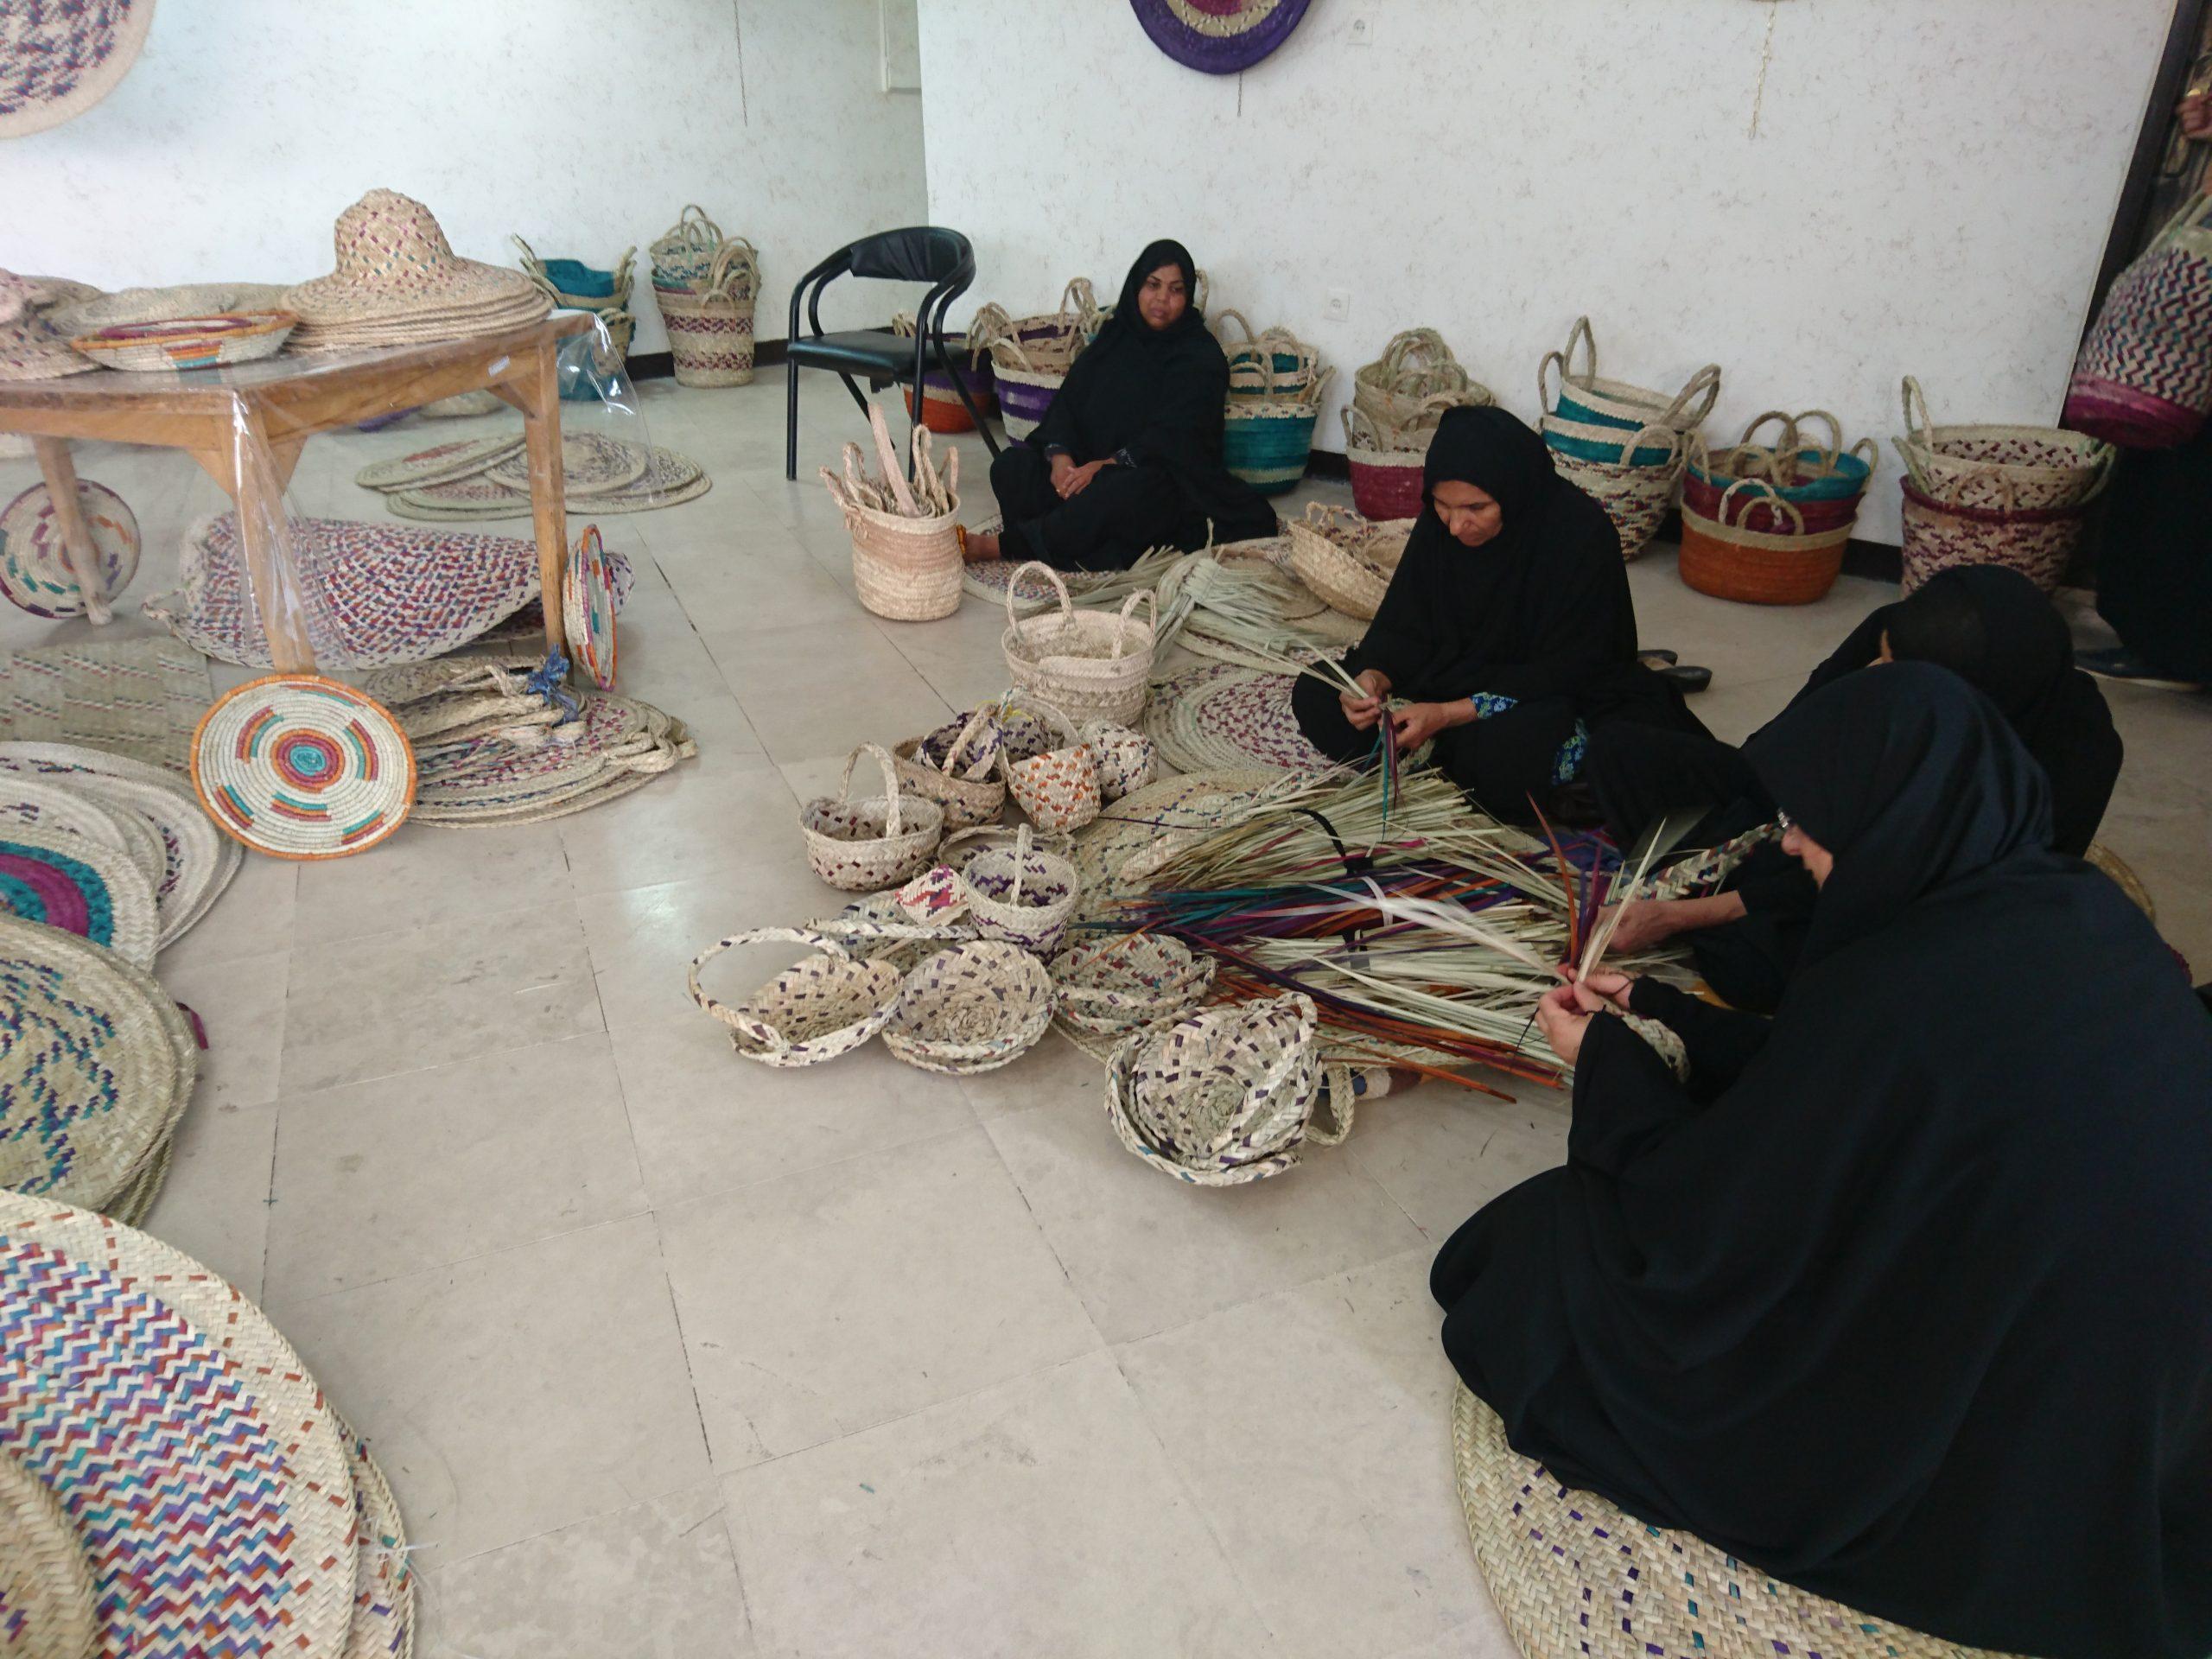 پویایی صنایع دستی در سایه کرونا